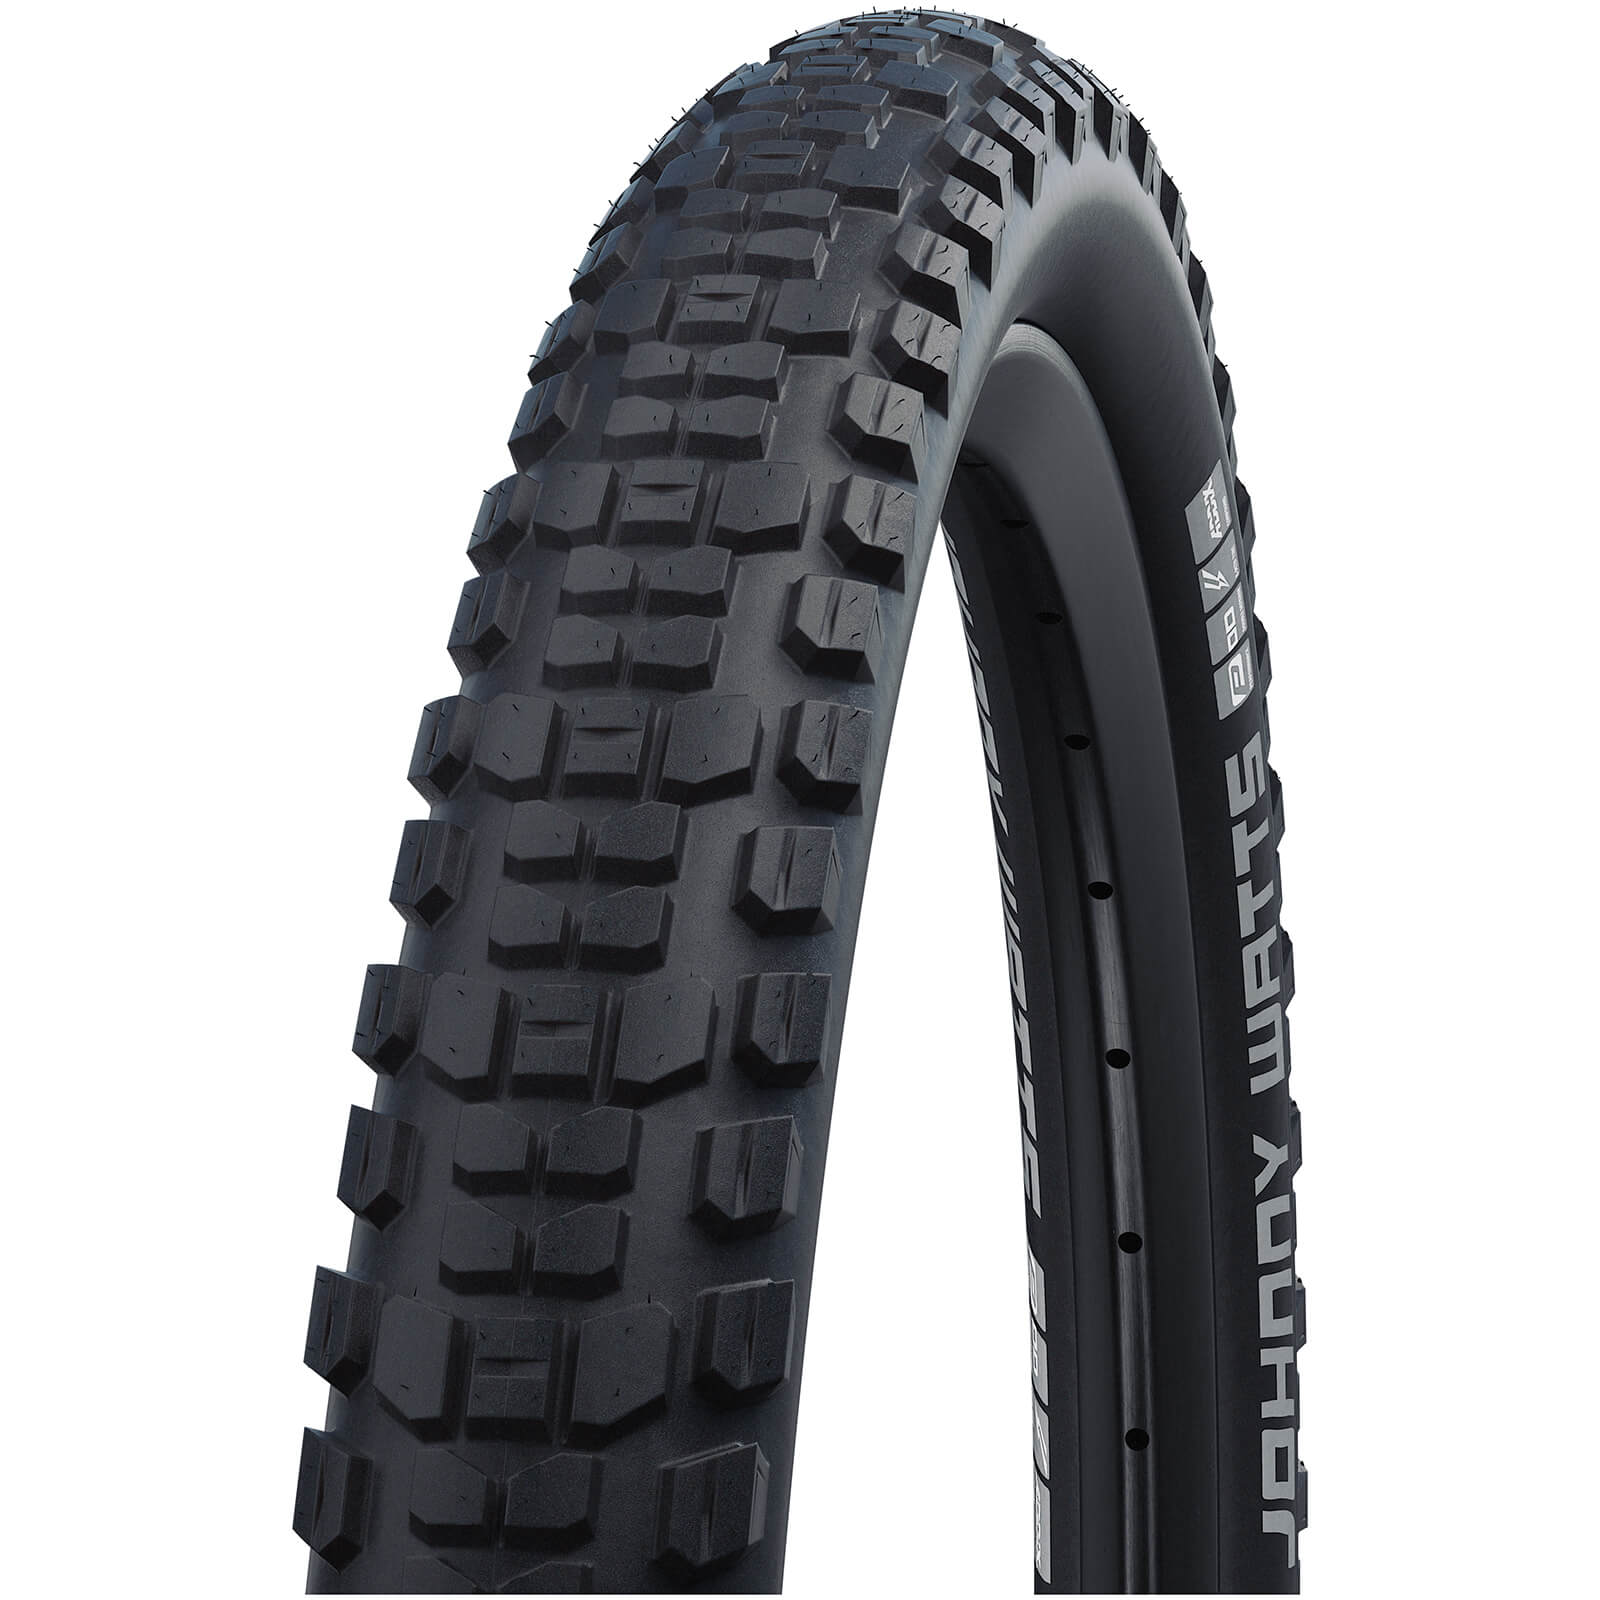 Schwalbe Johnny Watts Performance DD RaceGuard Tubeless MTB Tyre - Black - 27.5in x 2.80in - Black Reflex